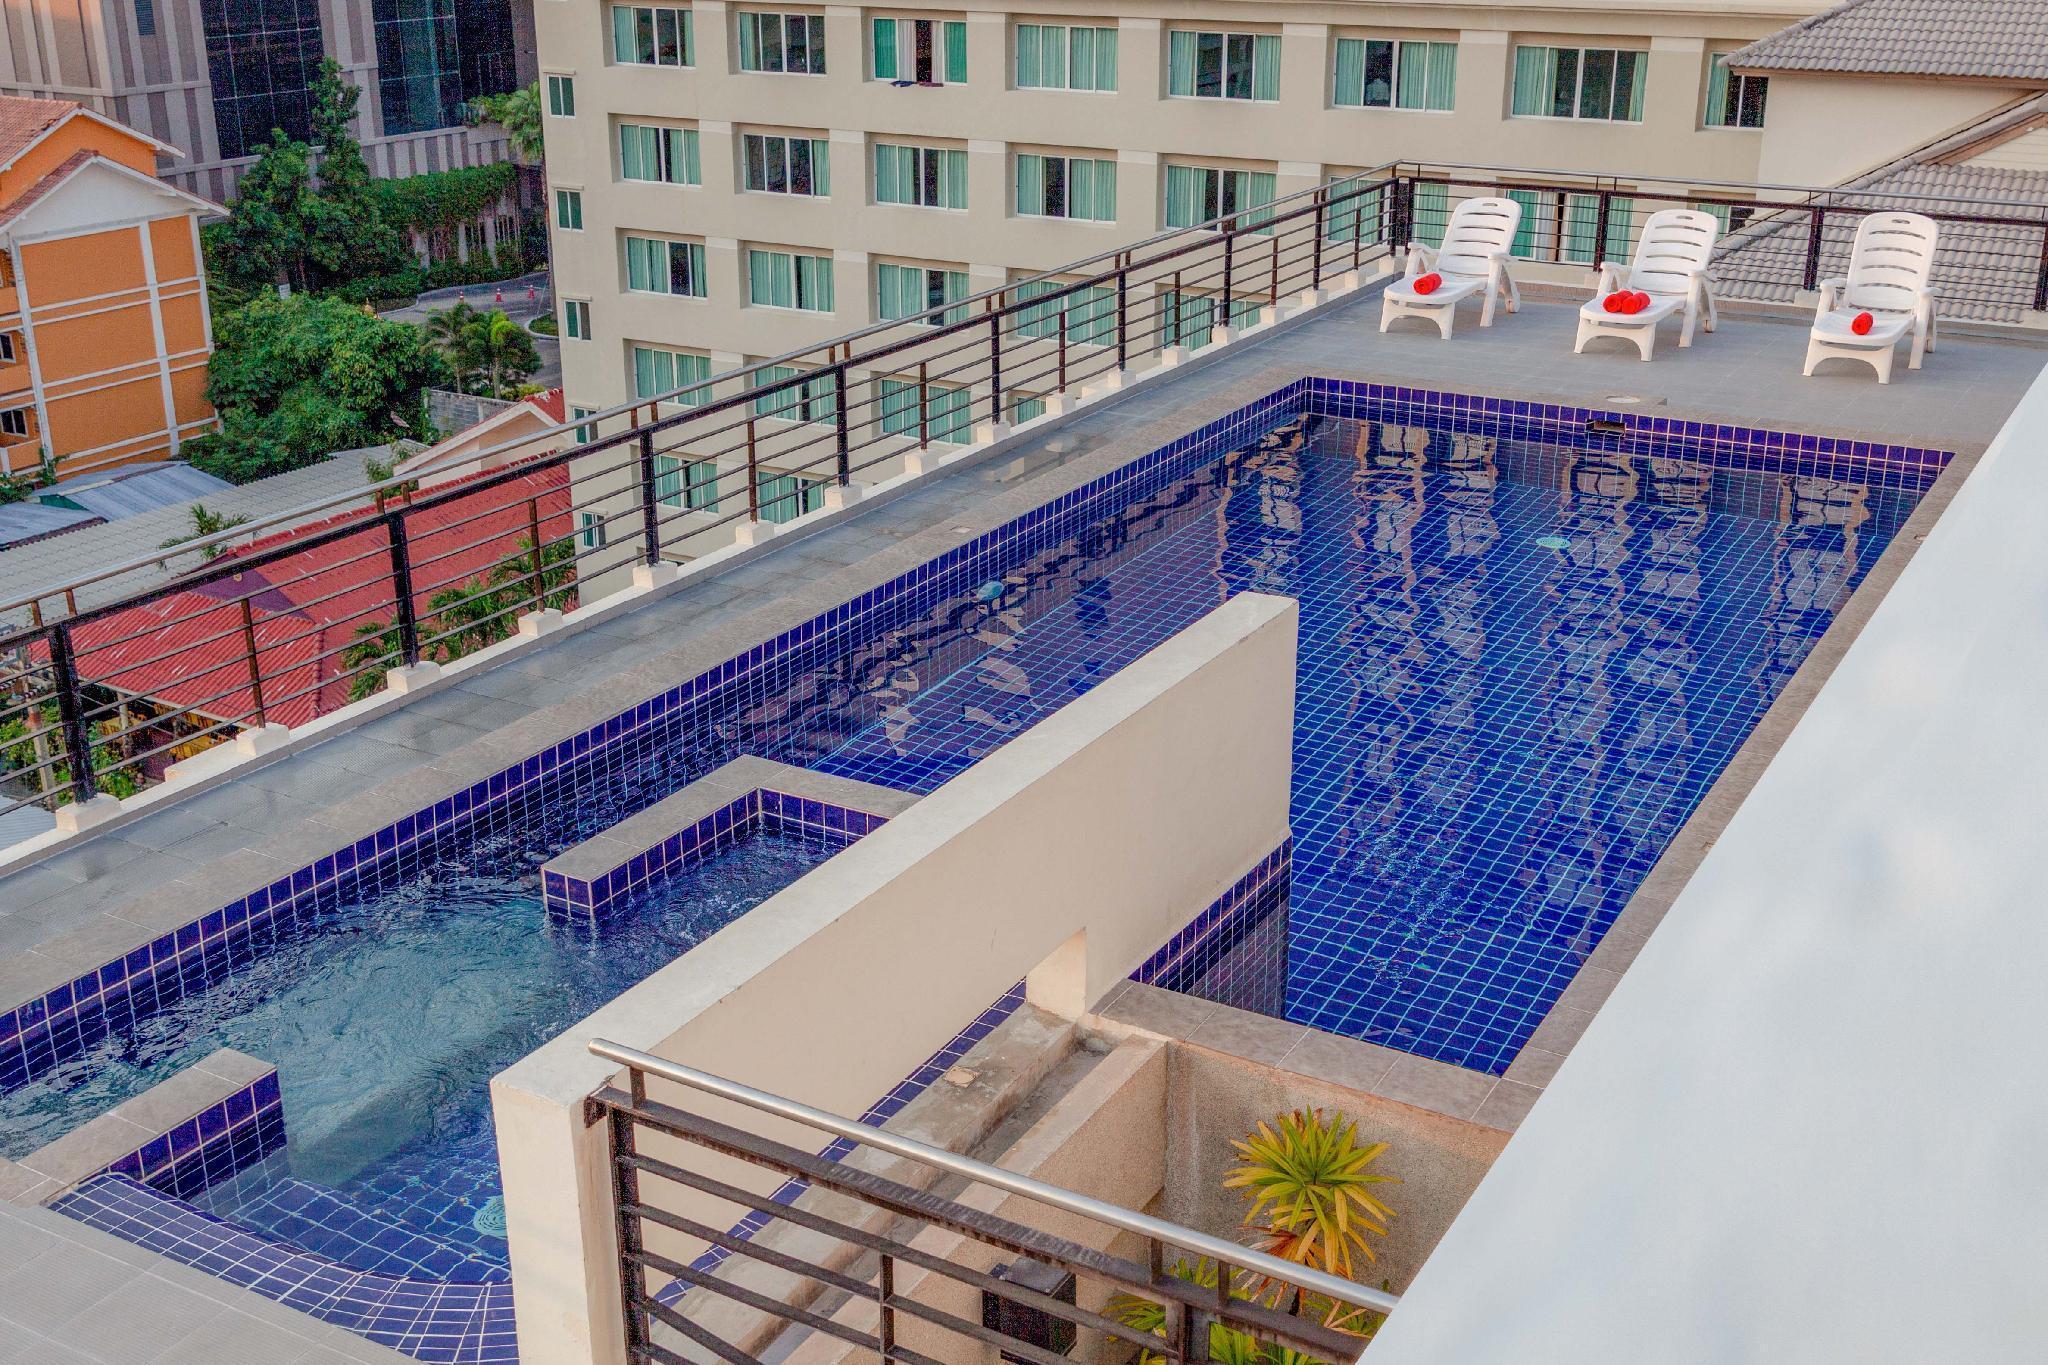 Citismart Luxury Apartments ซิตี้สมาร์ต ลักชัวรี อพาร์ตเมนต์